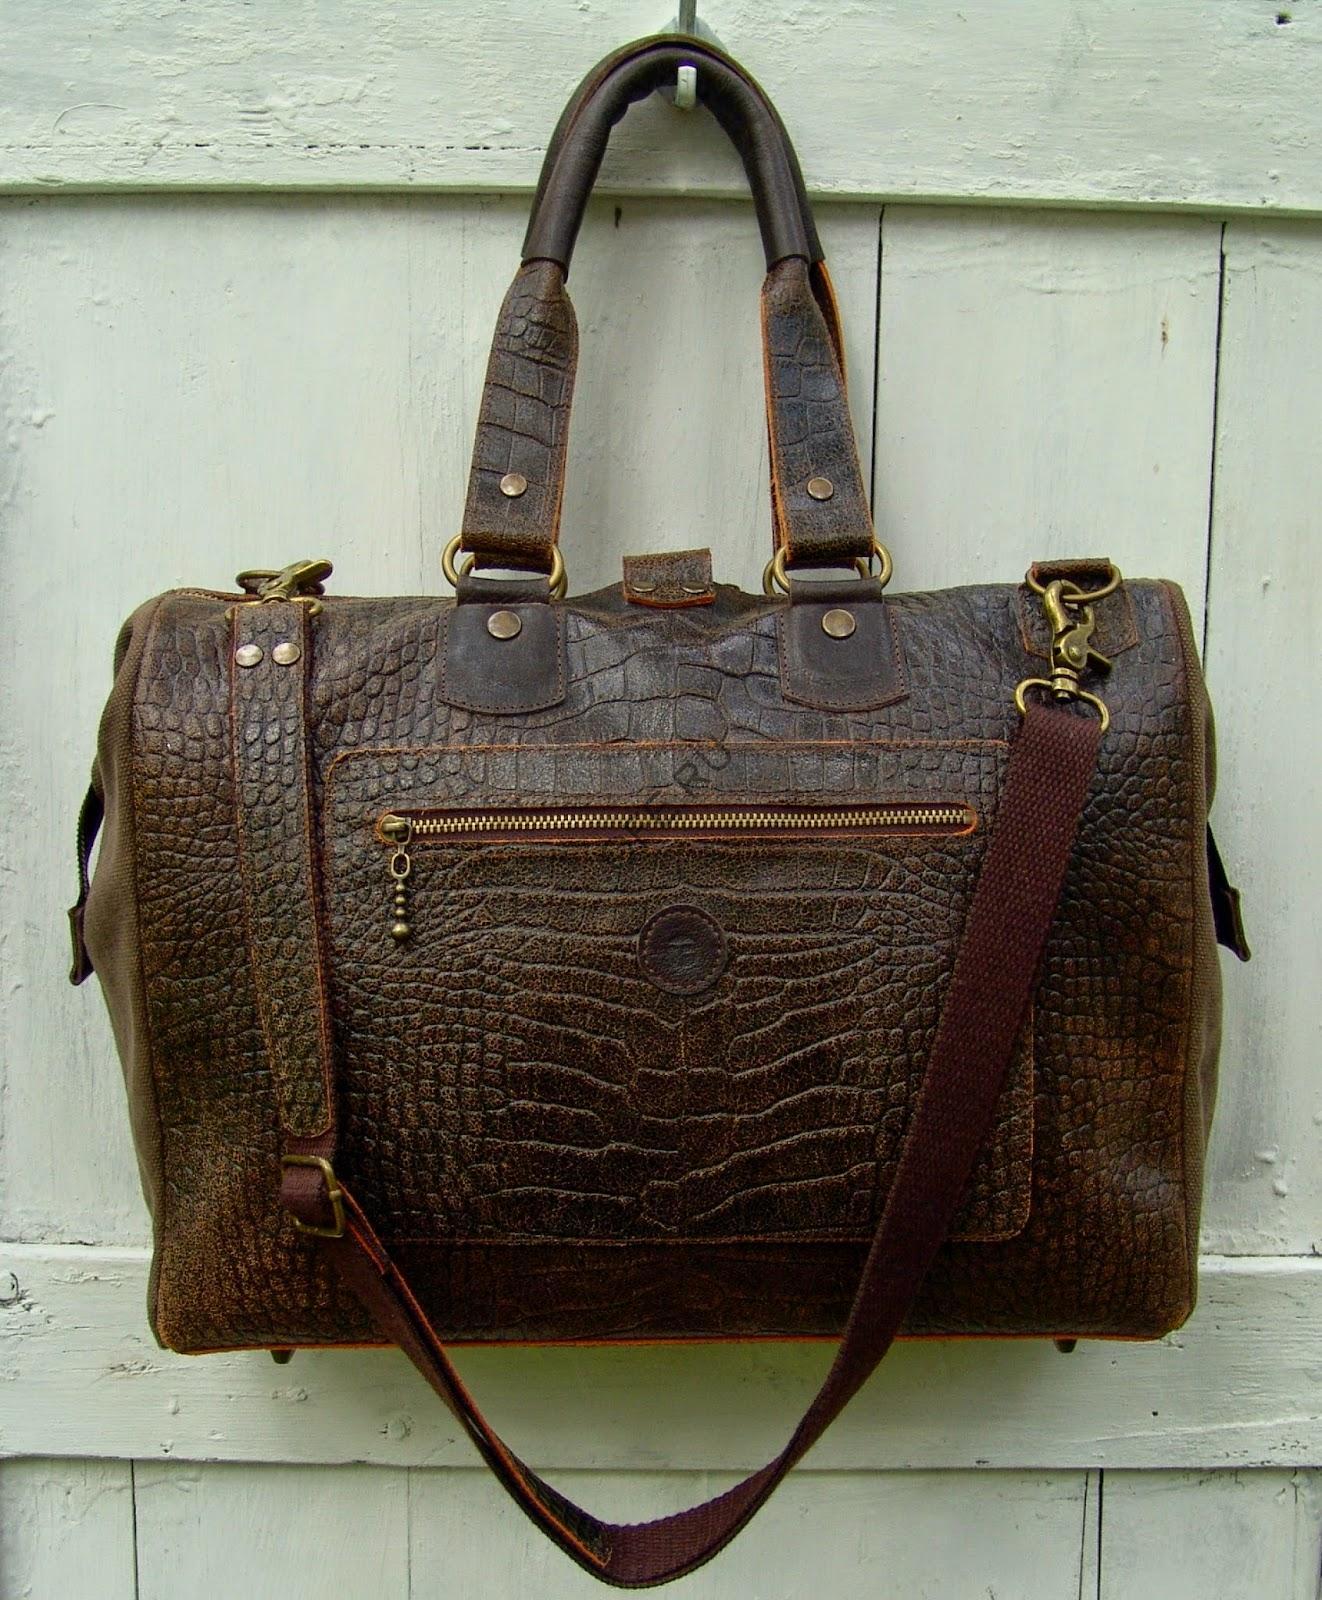 15db71cb9bb6 Осенний сезон: какую сумочку выбрать ...